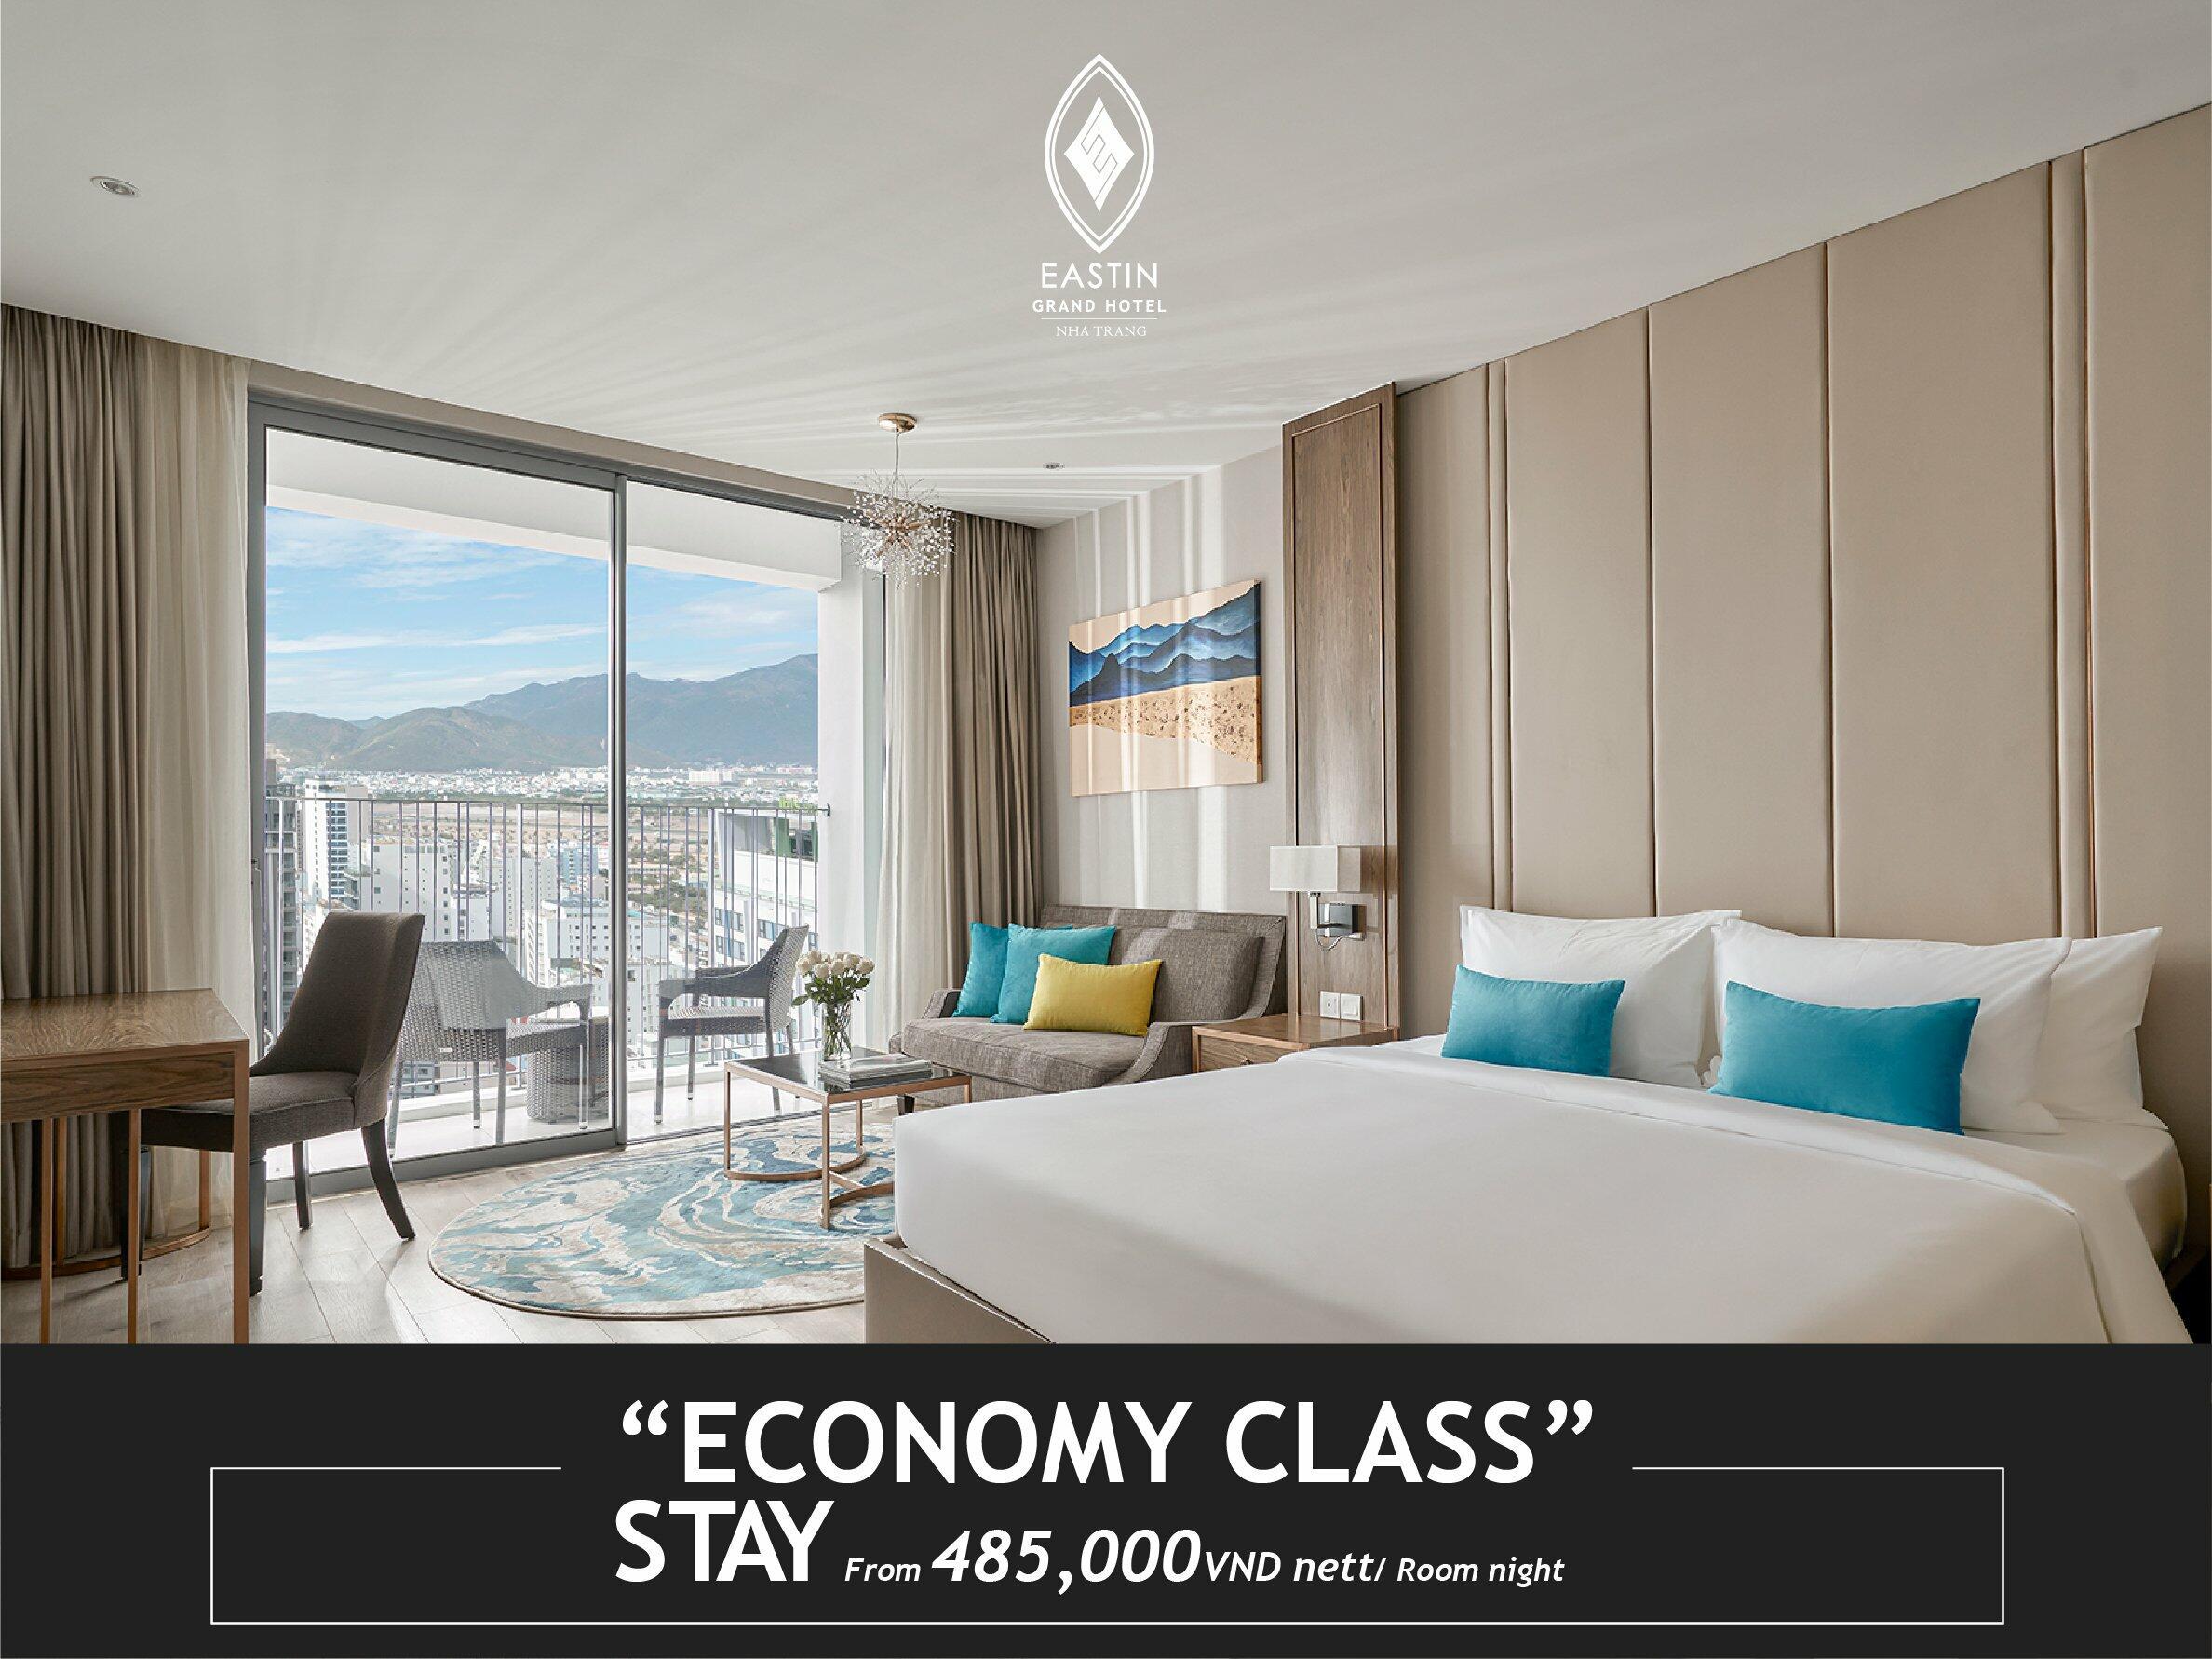 Economy Class Stay  - Eastin Hotel